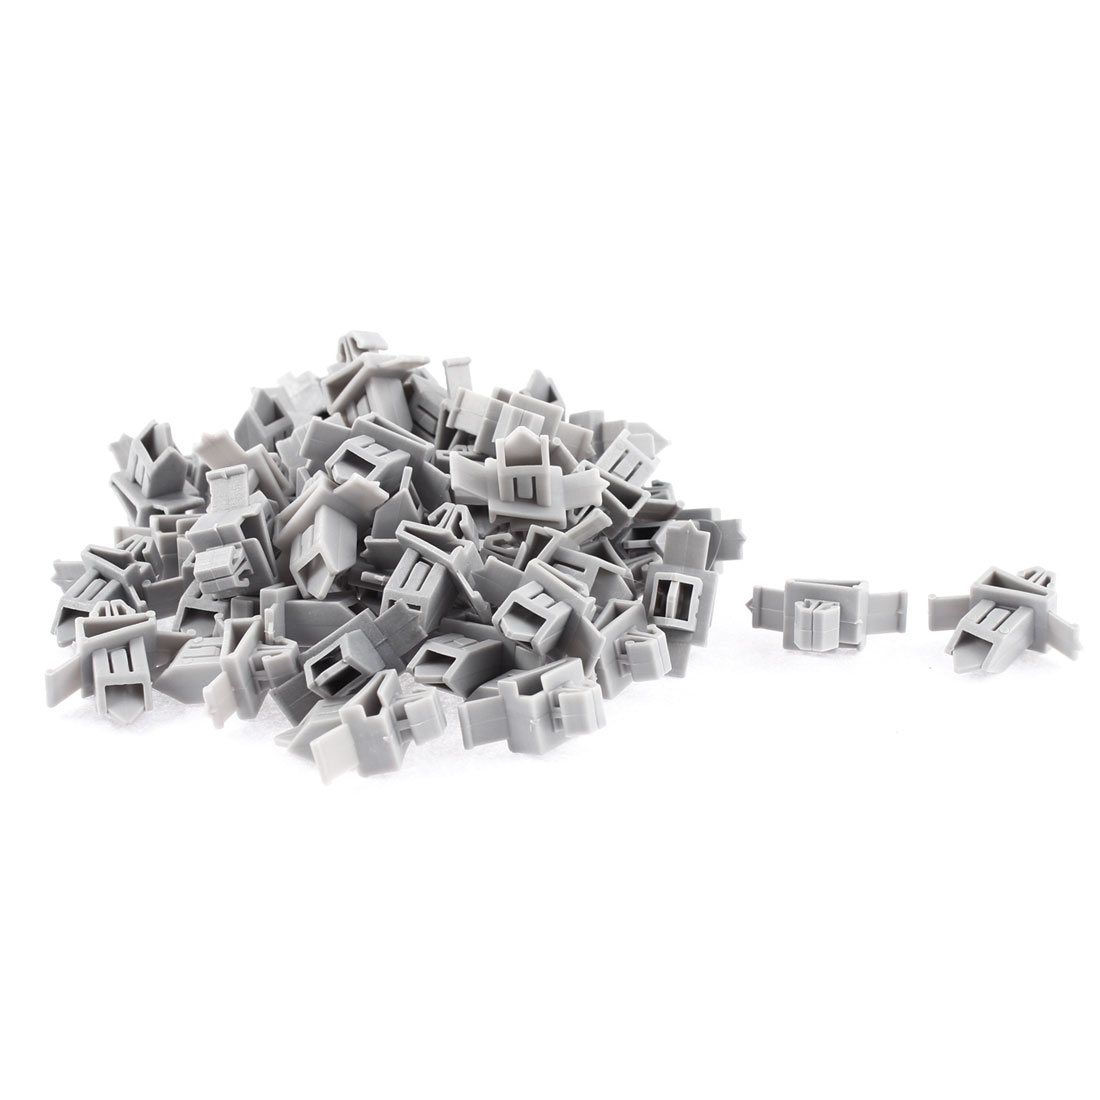 50 Pcs Gray Plastic Rivet Bumper Lining Trim Panel Retainer Fastener Clips for Toyota Prado